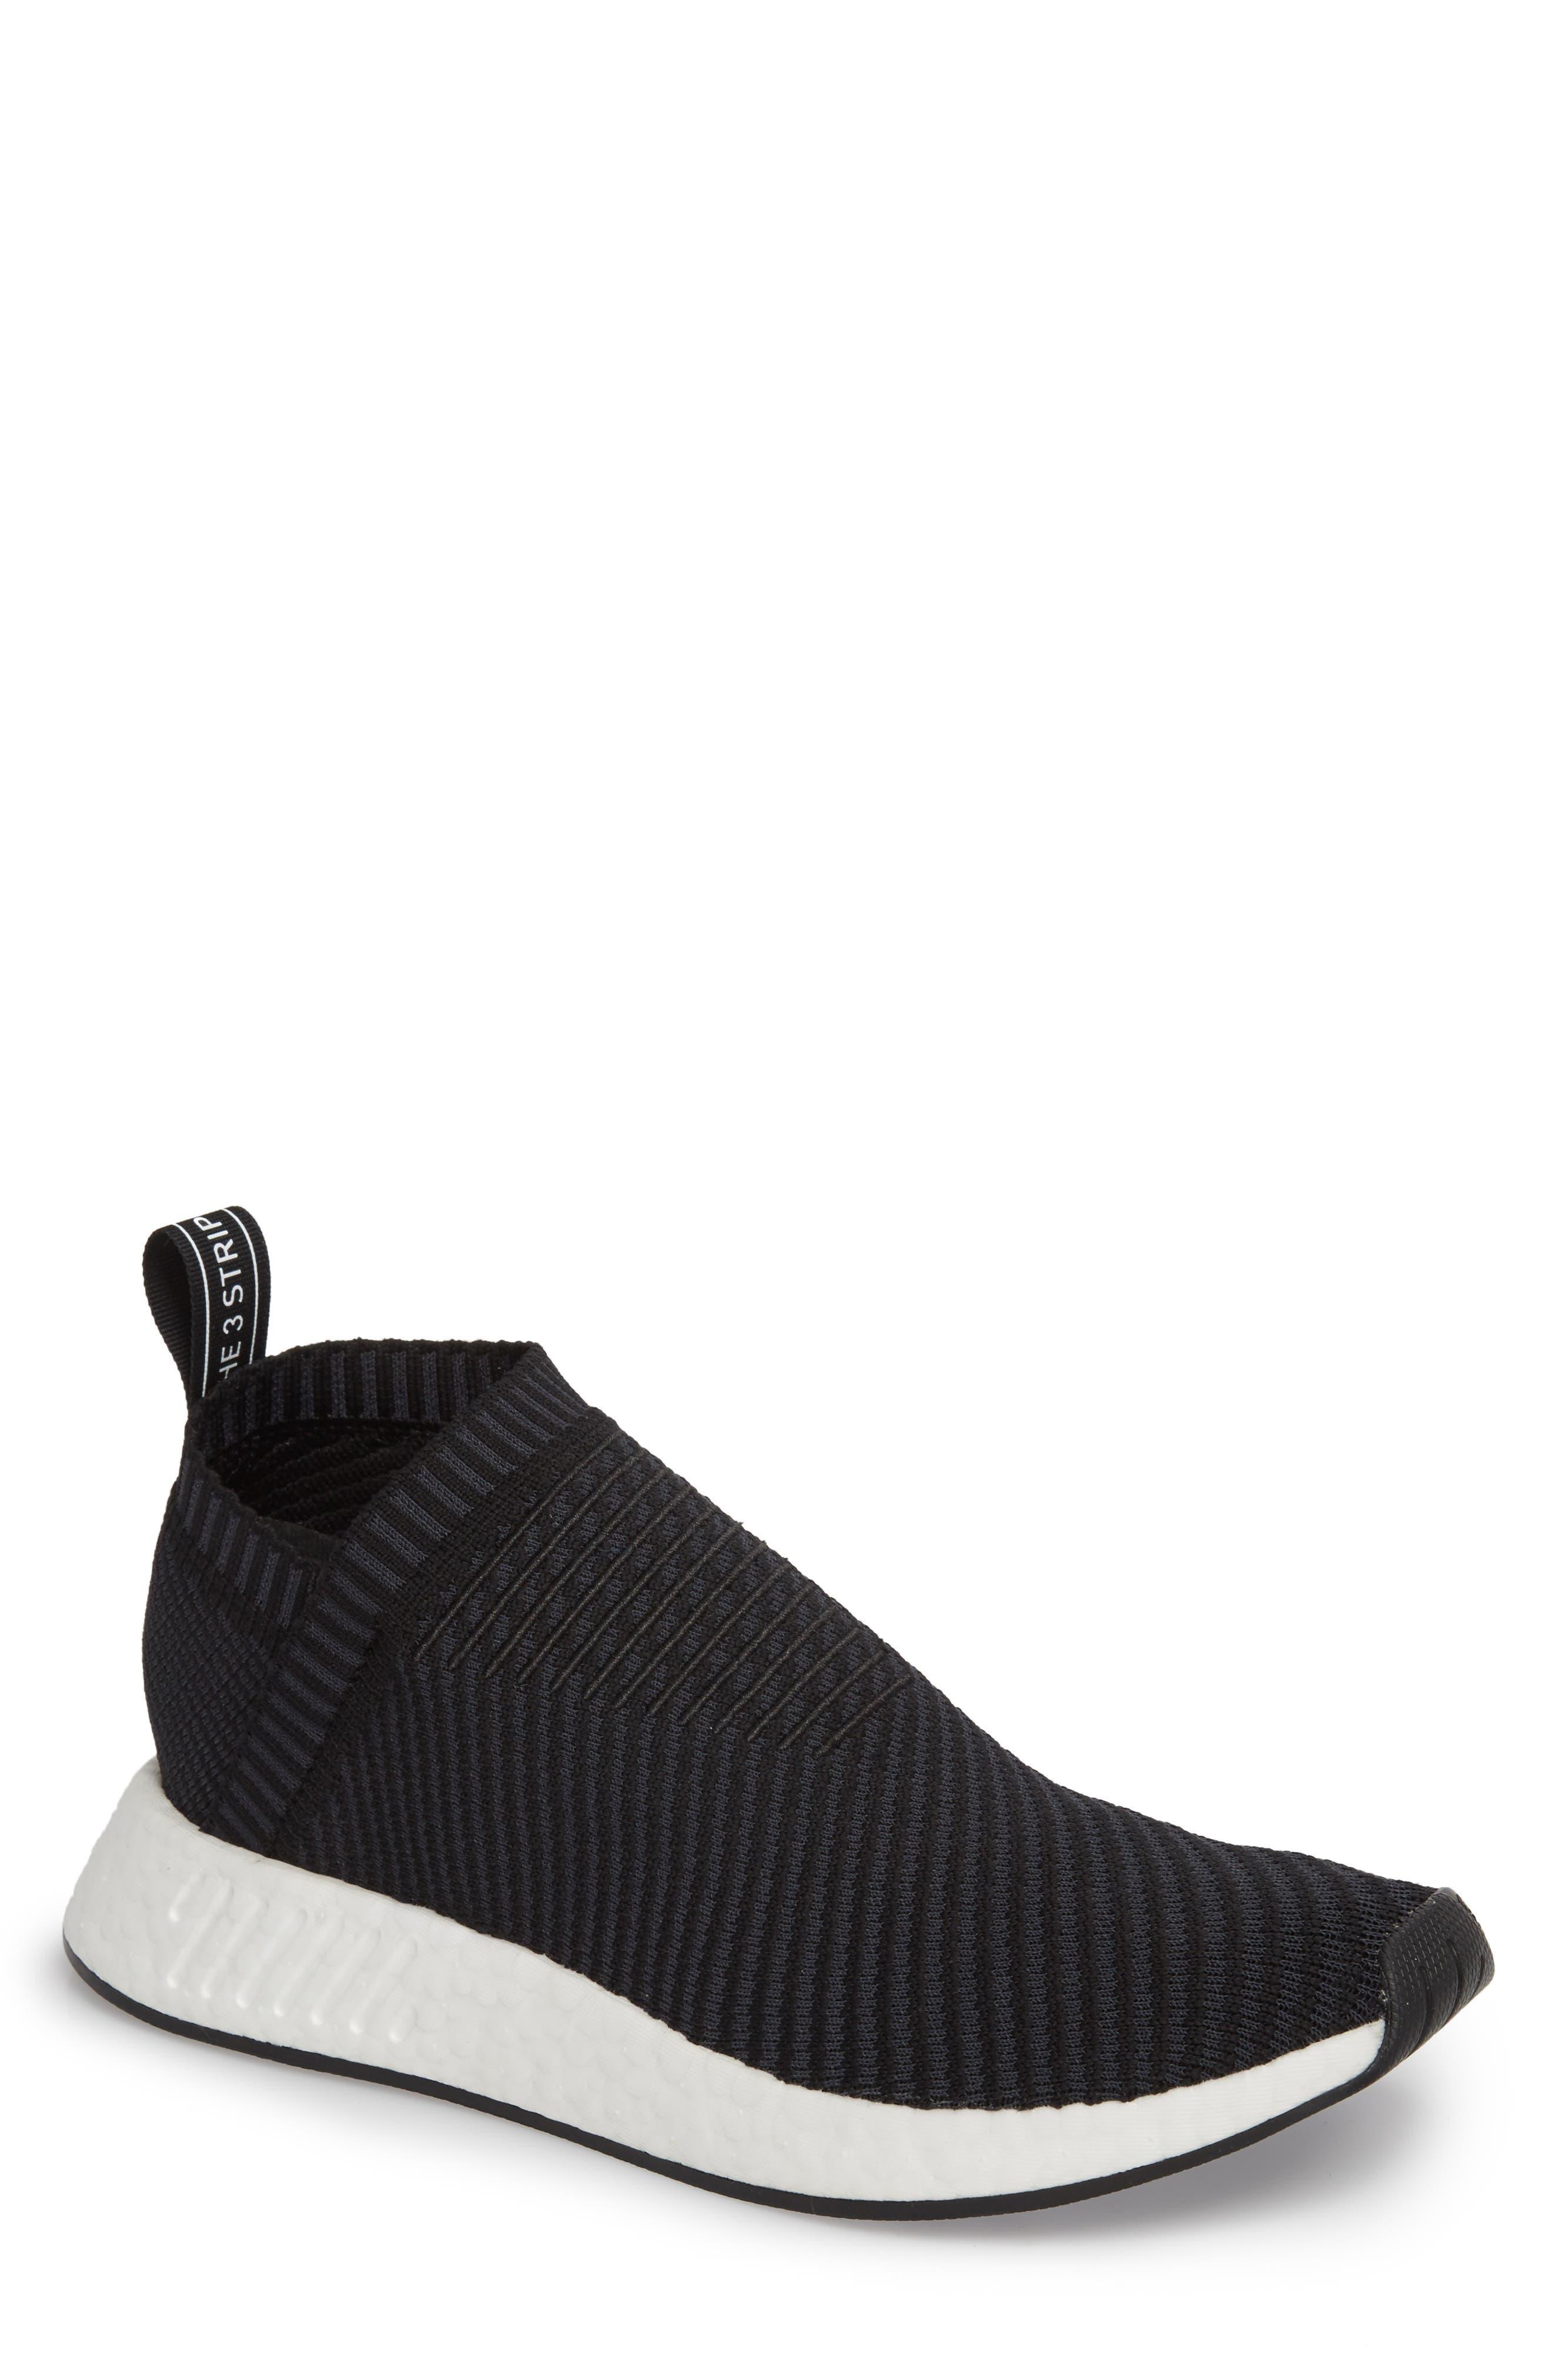 adidas NMD CS2 Primeknit Running Shoe (Men)